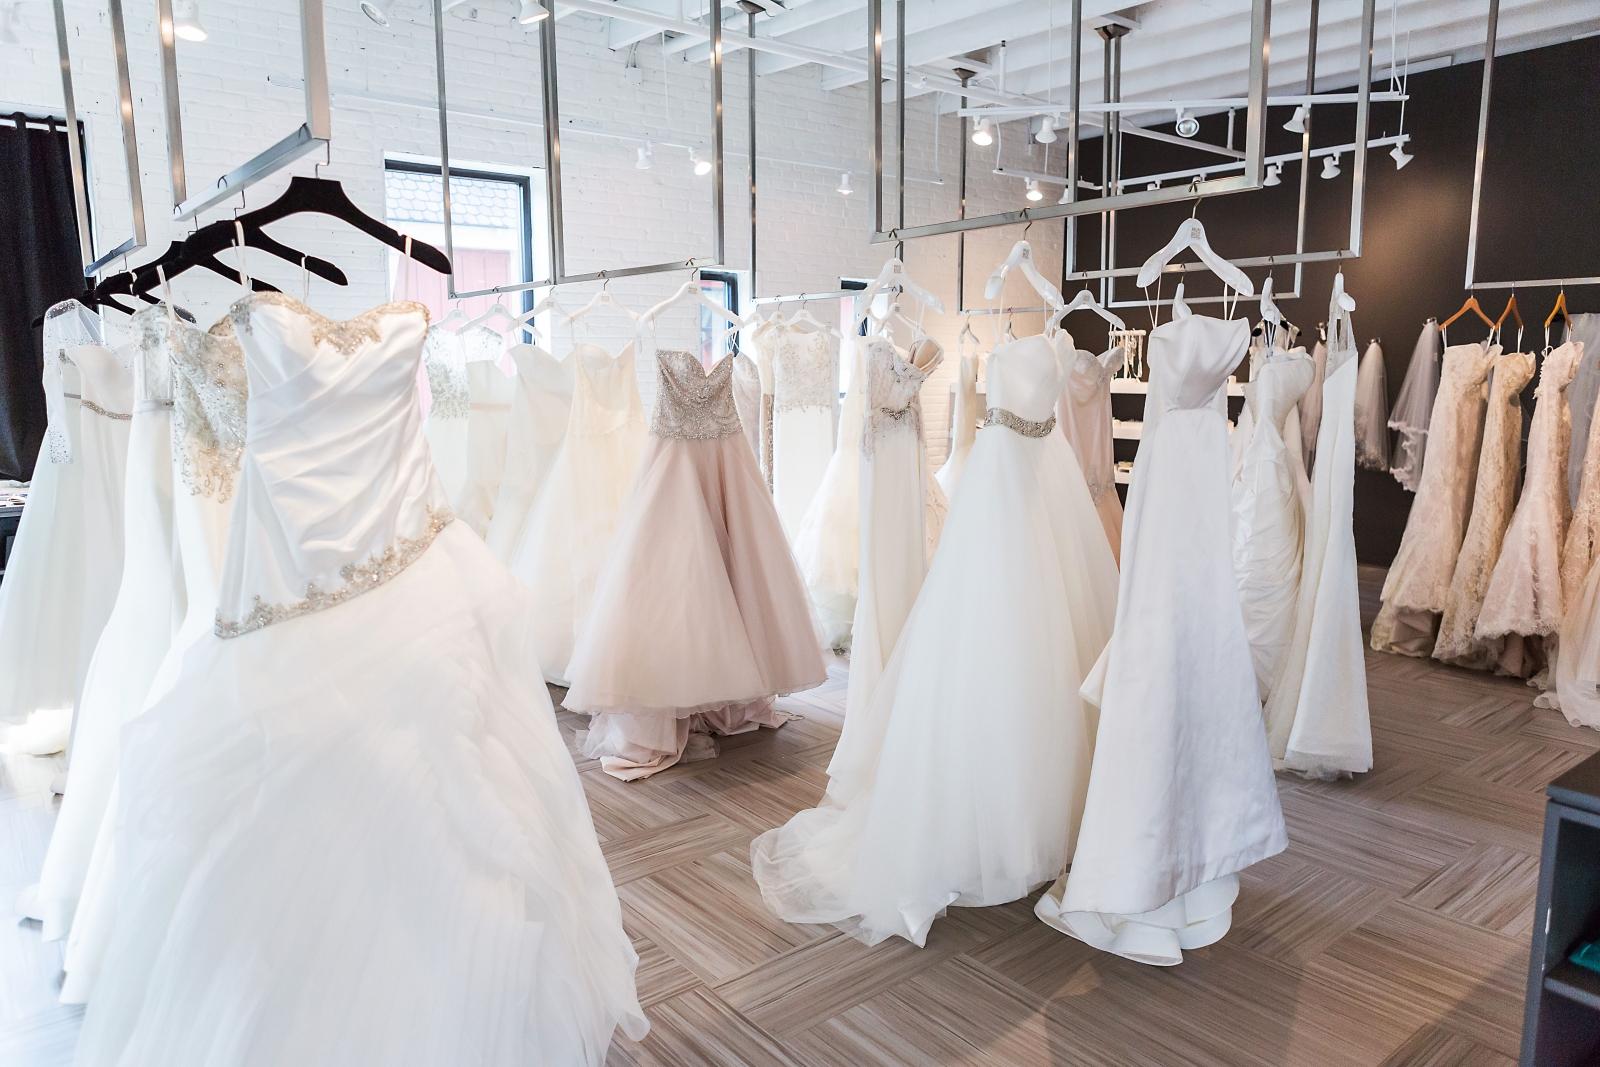 Wedding Dress Shopping, Wedding Dress Shopping Tips, How to Wedding Dress Shop, Tips for Wedding Dress Shopping, Weddings, Wedding Dress, Dream Wedding Dress, Popular Pin